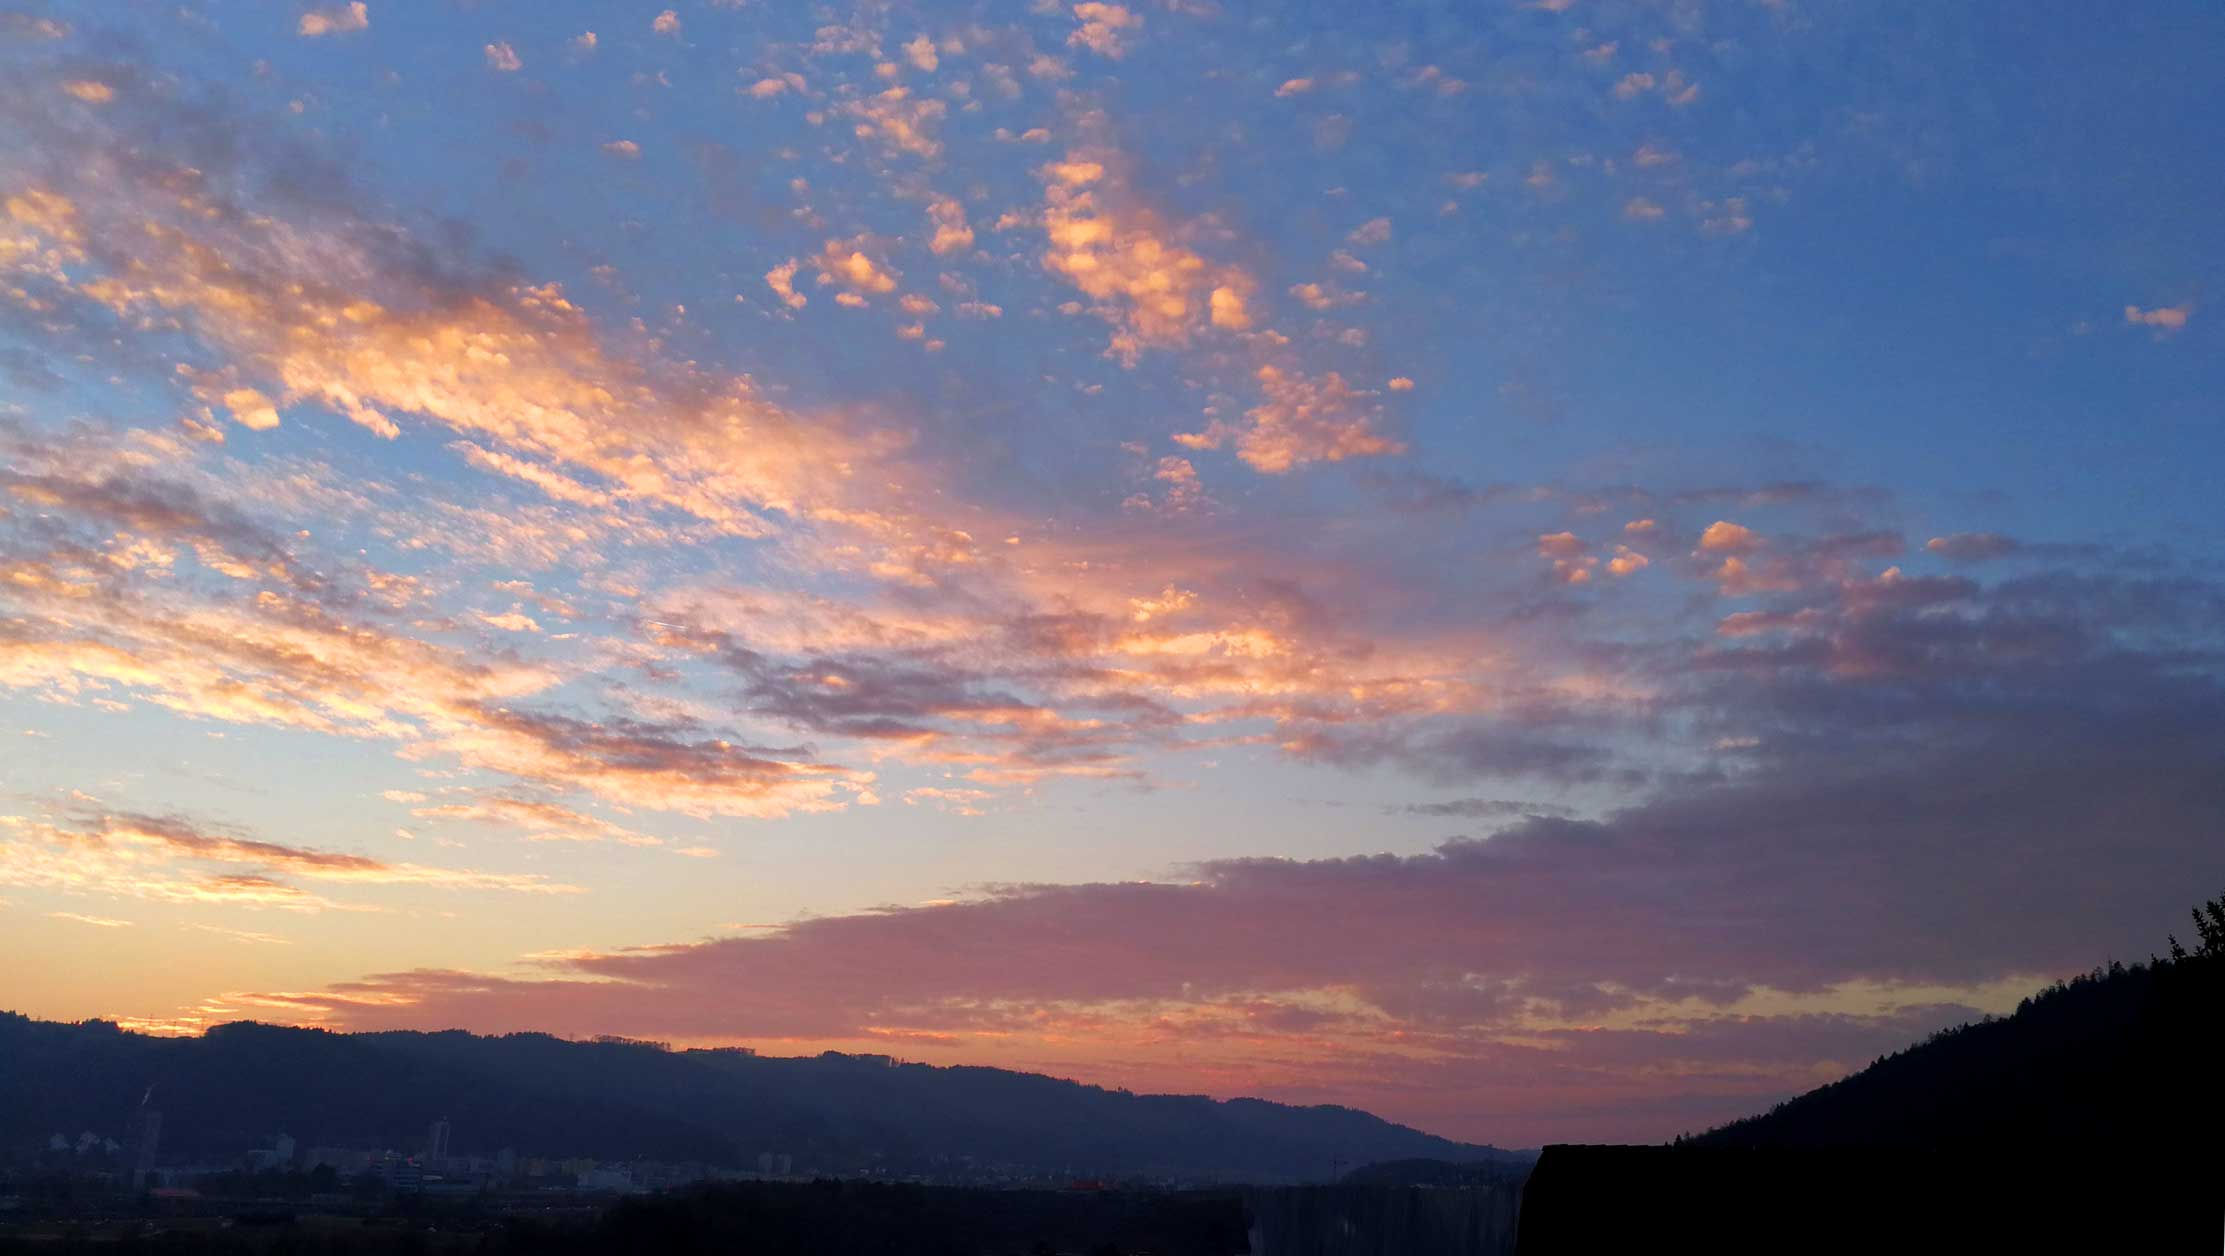 sunset-19-2-2017